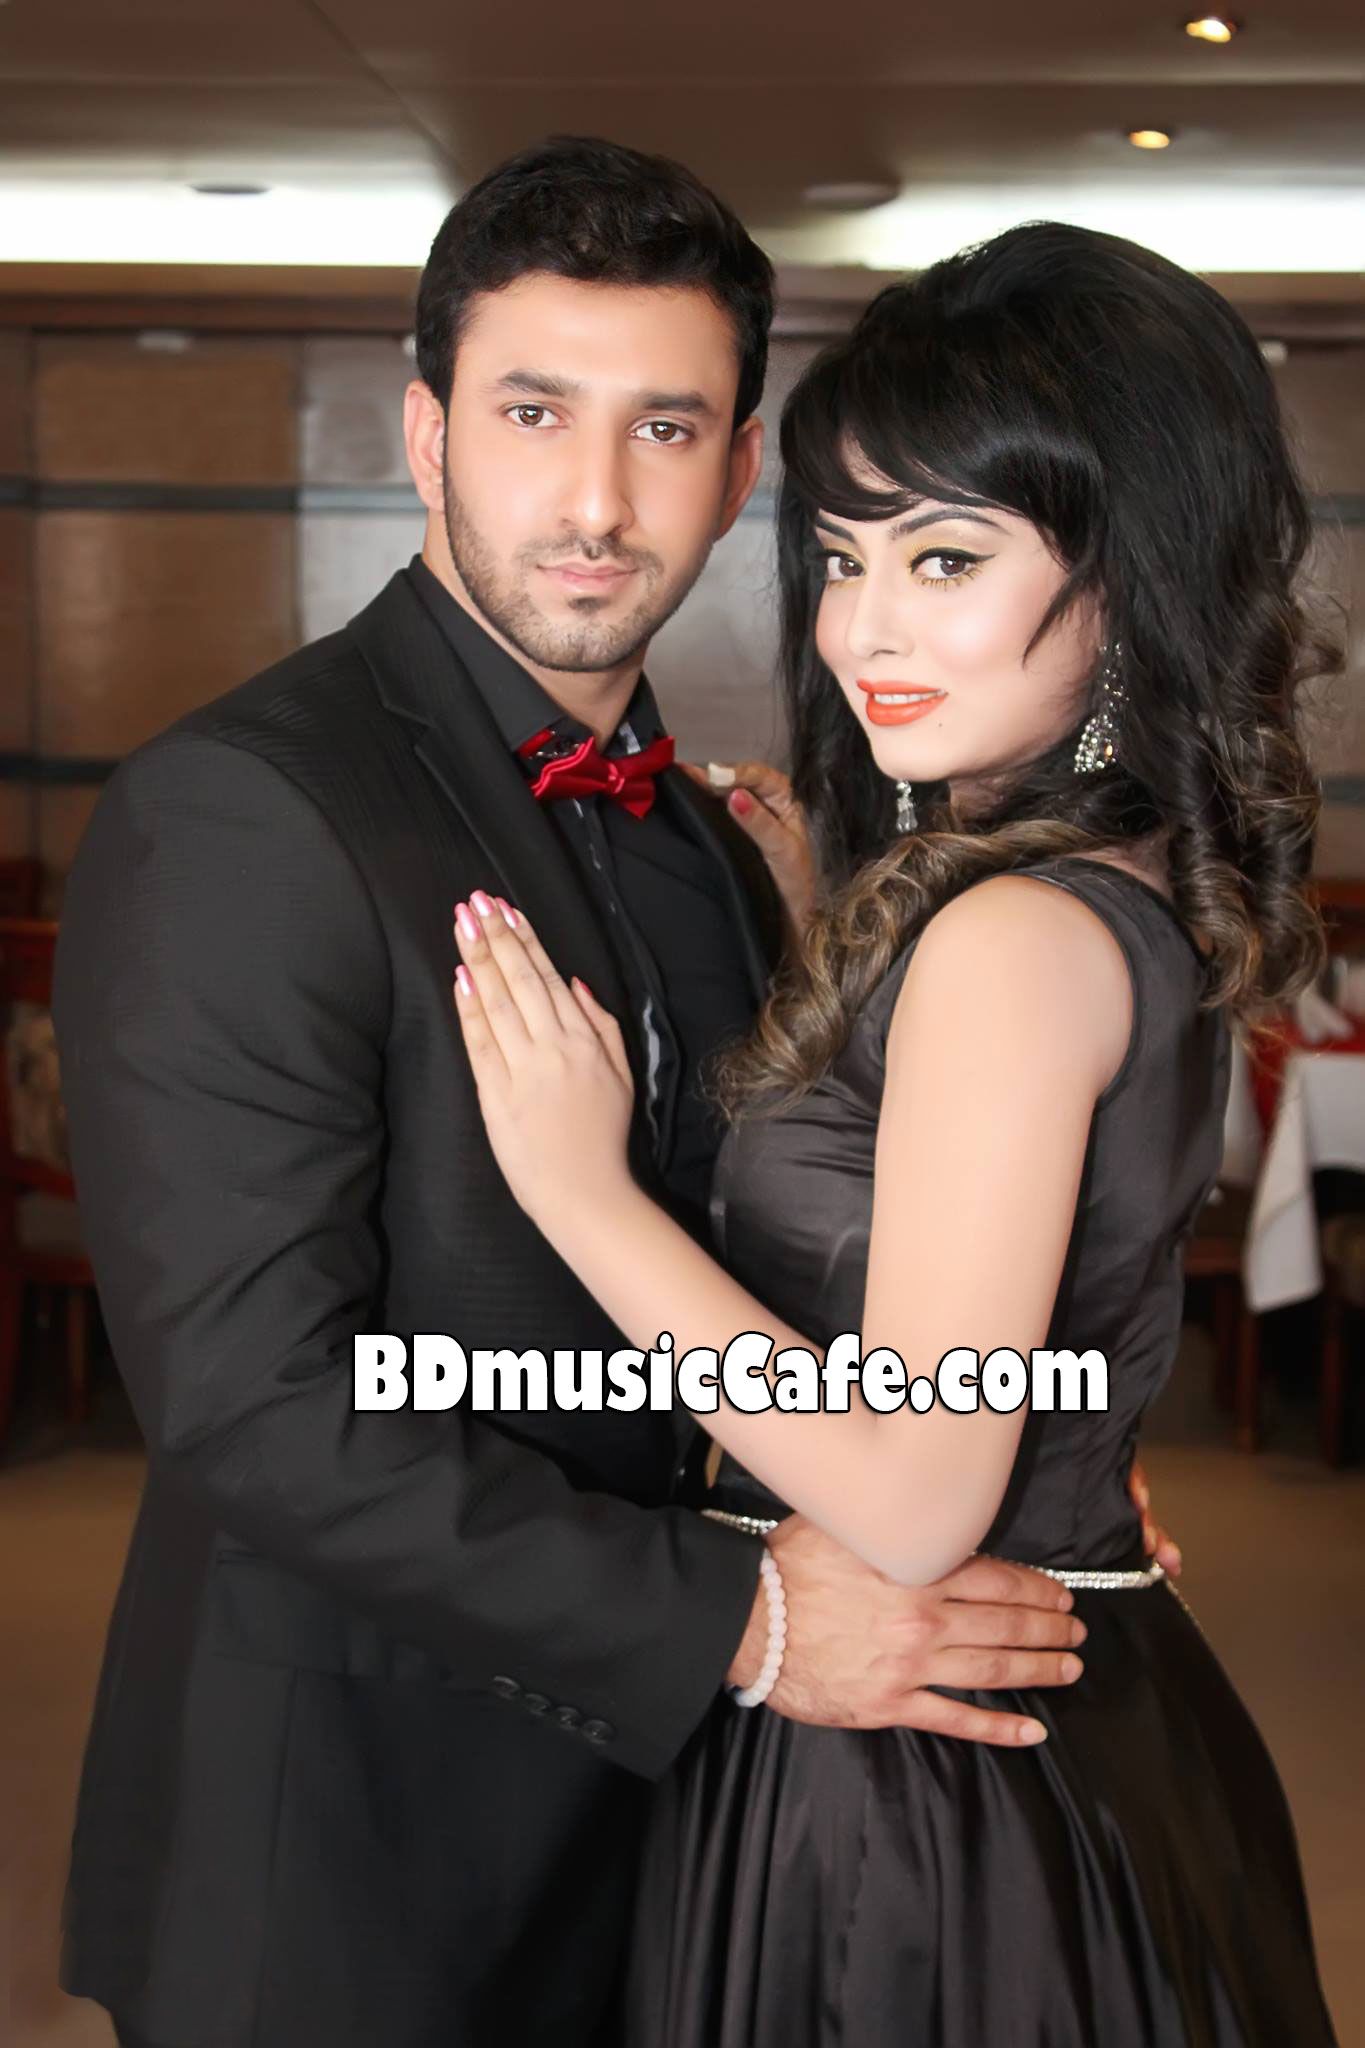 Bangladeshi boyfriend and girlfriend in restaurant2full on hotcamgirlsin 4